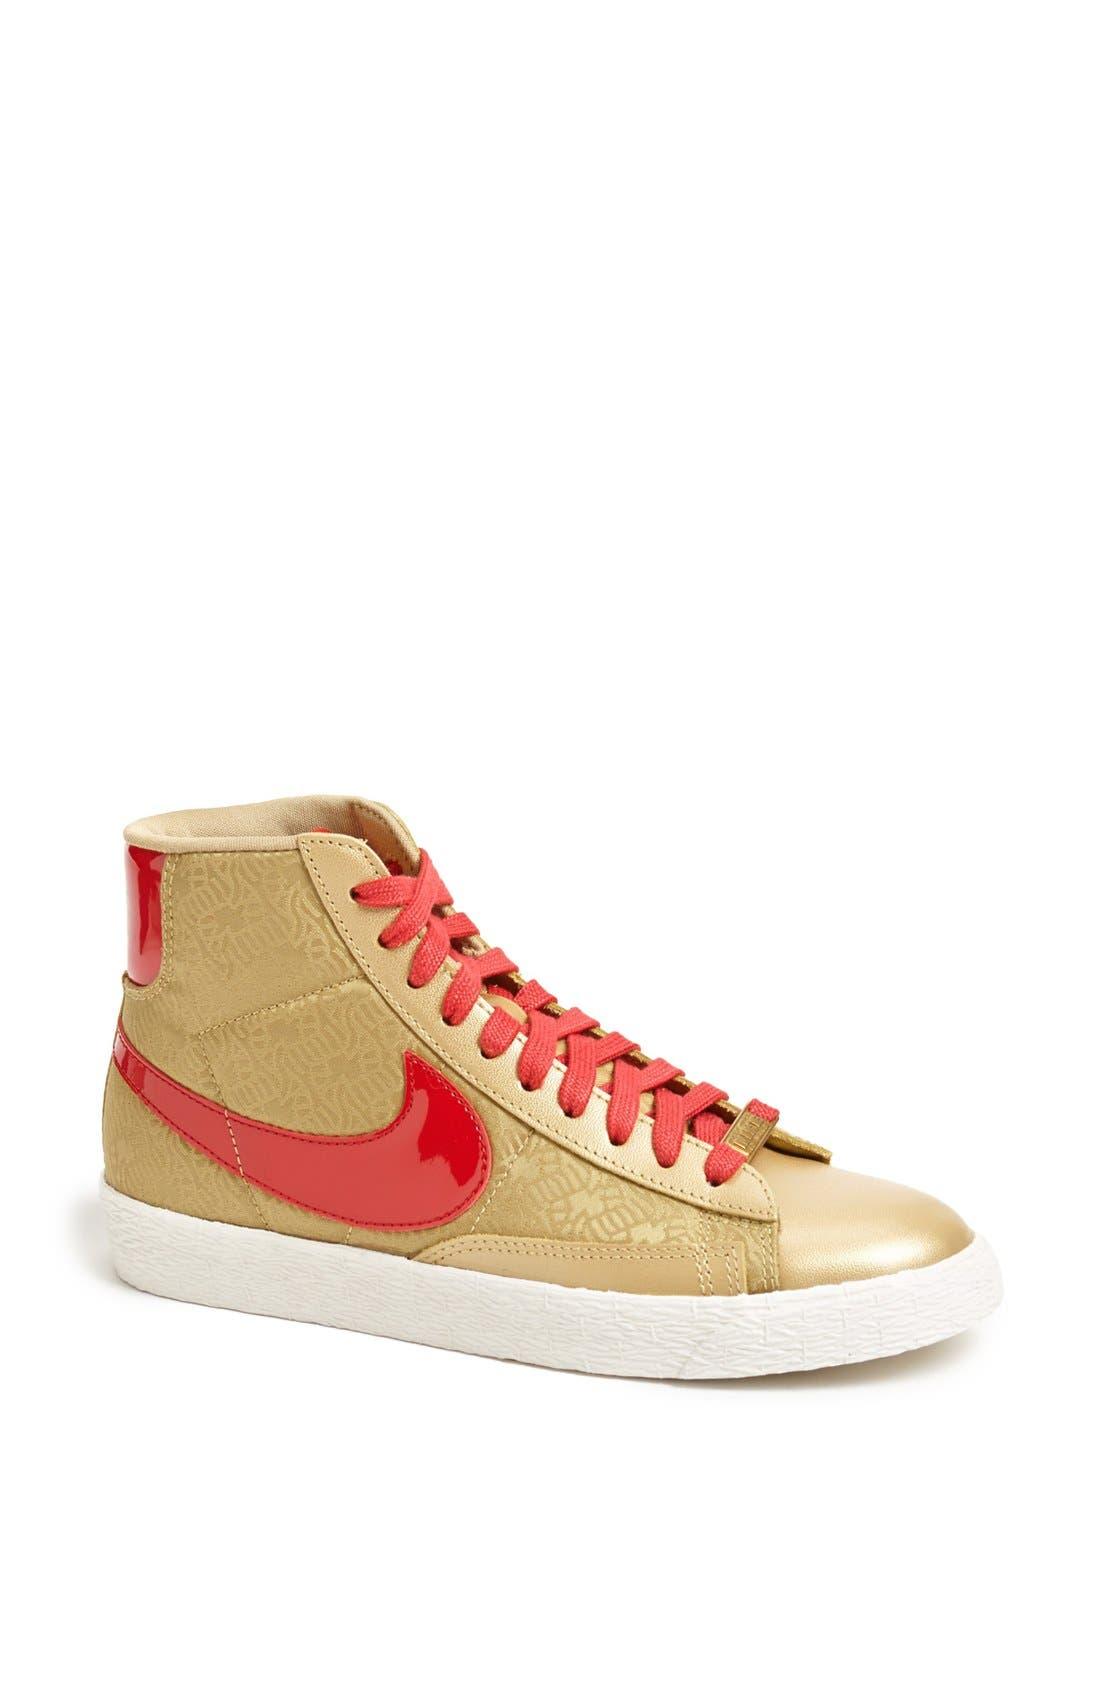 Alternate Image 1 Selected - Nike 'Blazer Mid - Year of the Horse' Sneaker (Women)